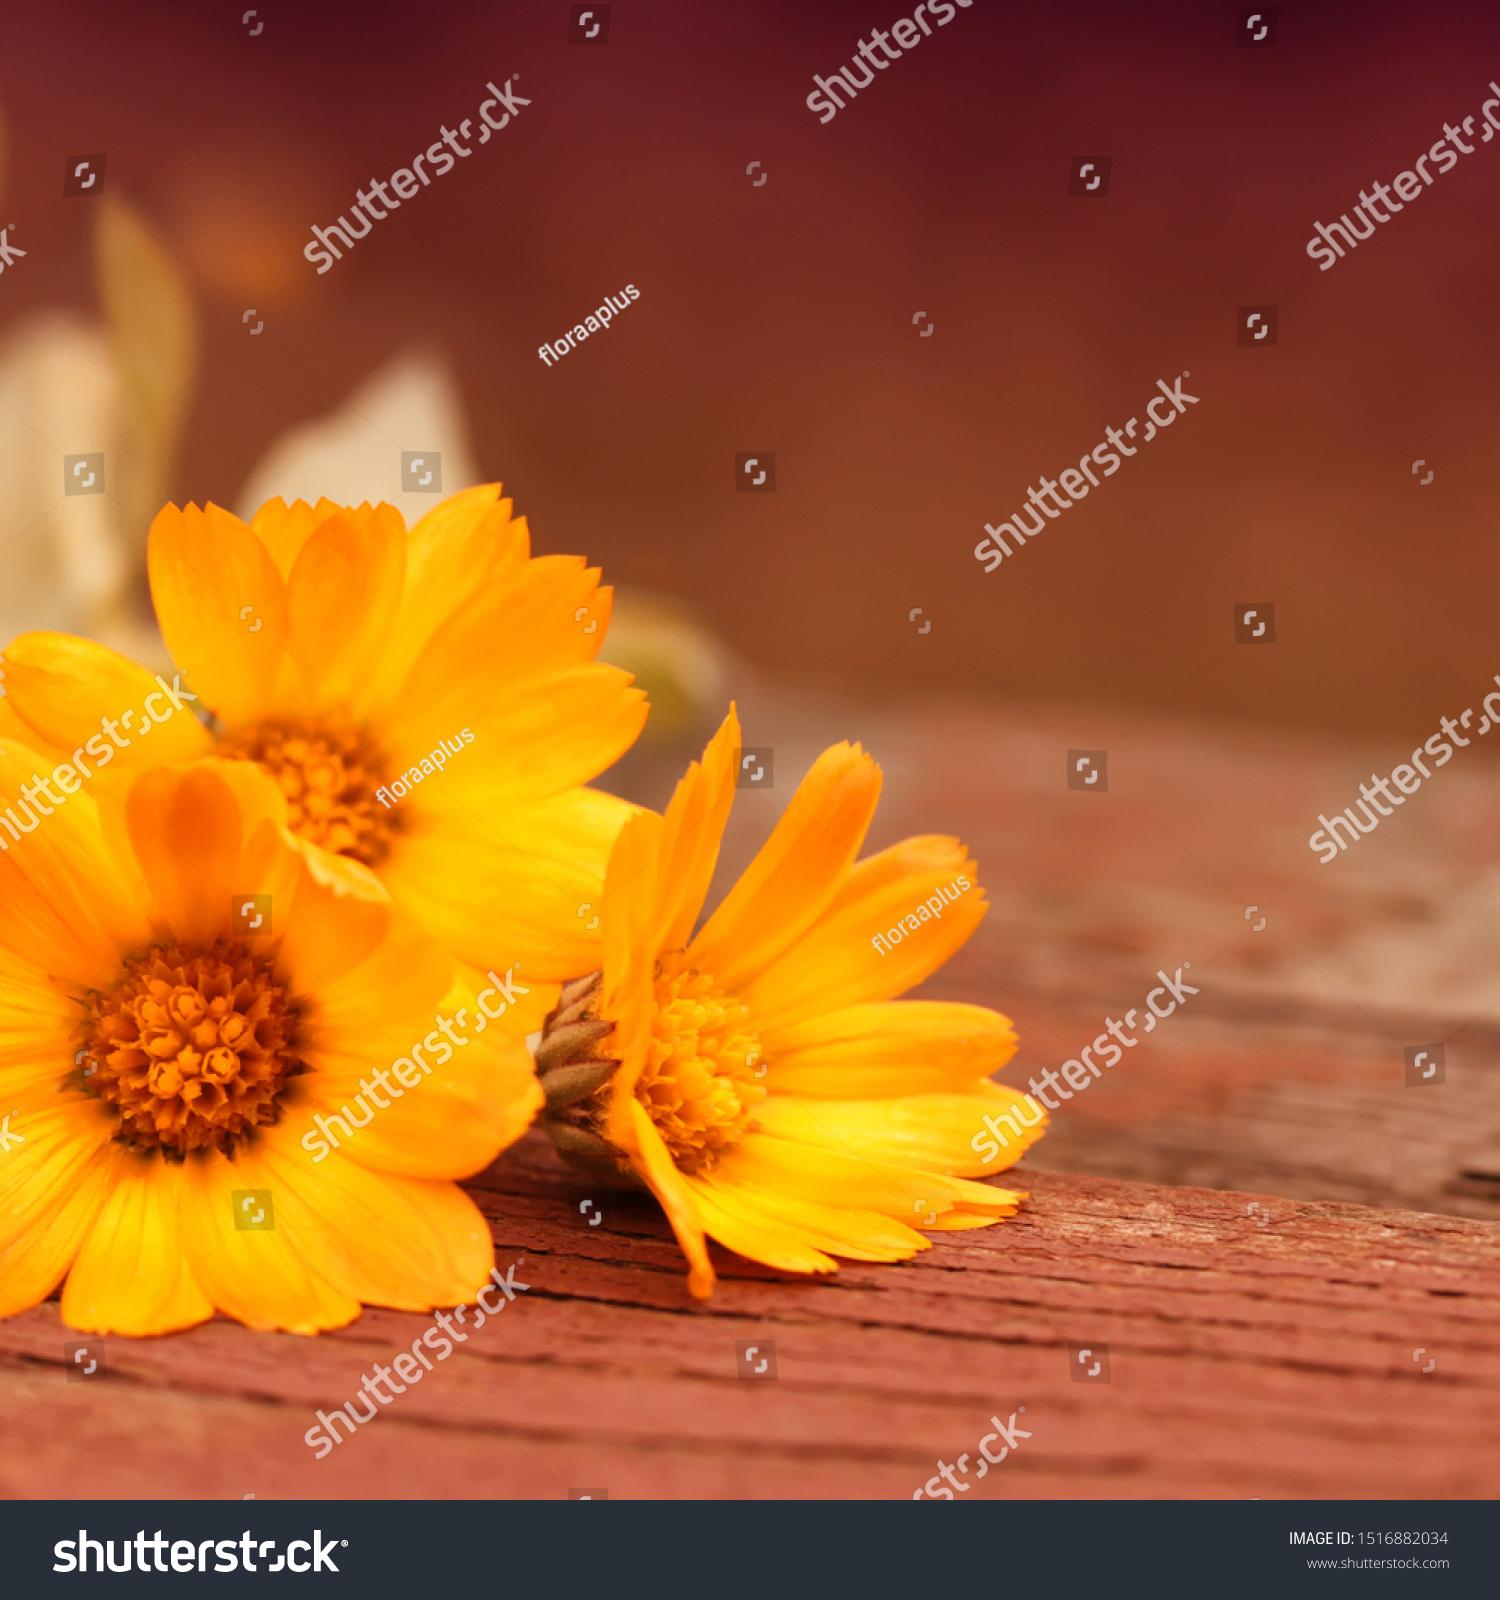 stock-photo-warm-abstract-autumn-backgro